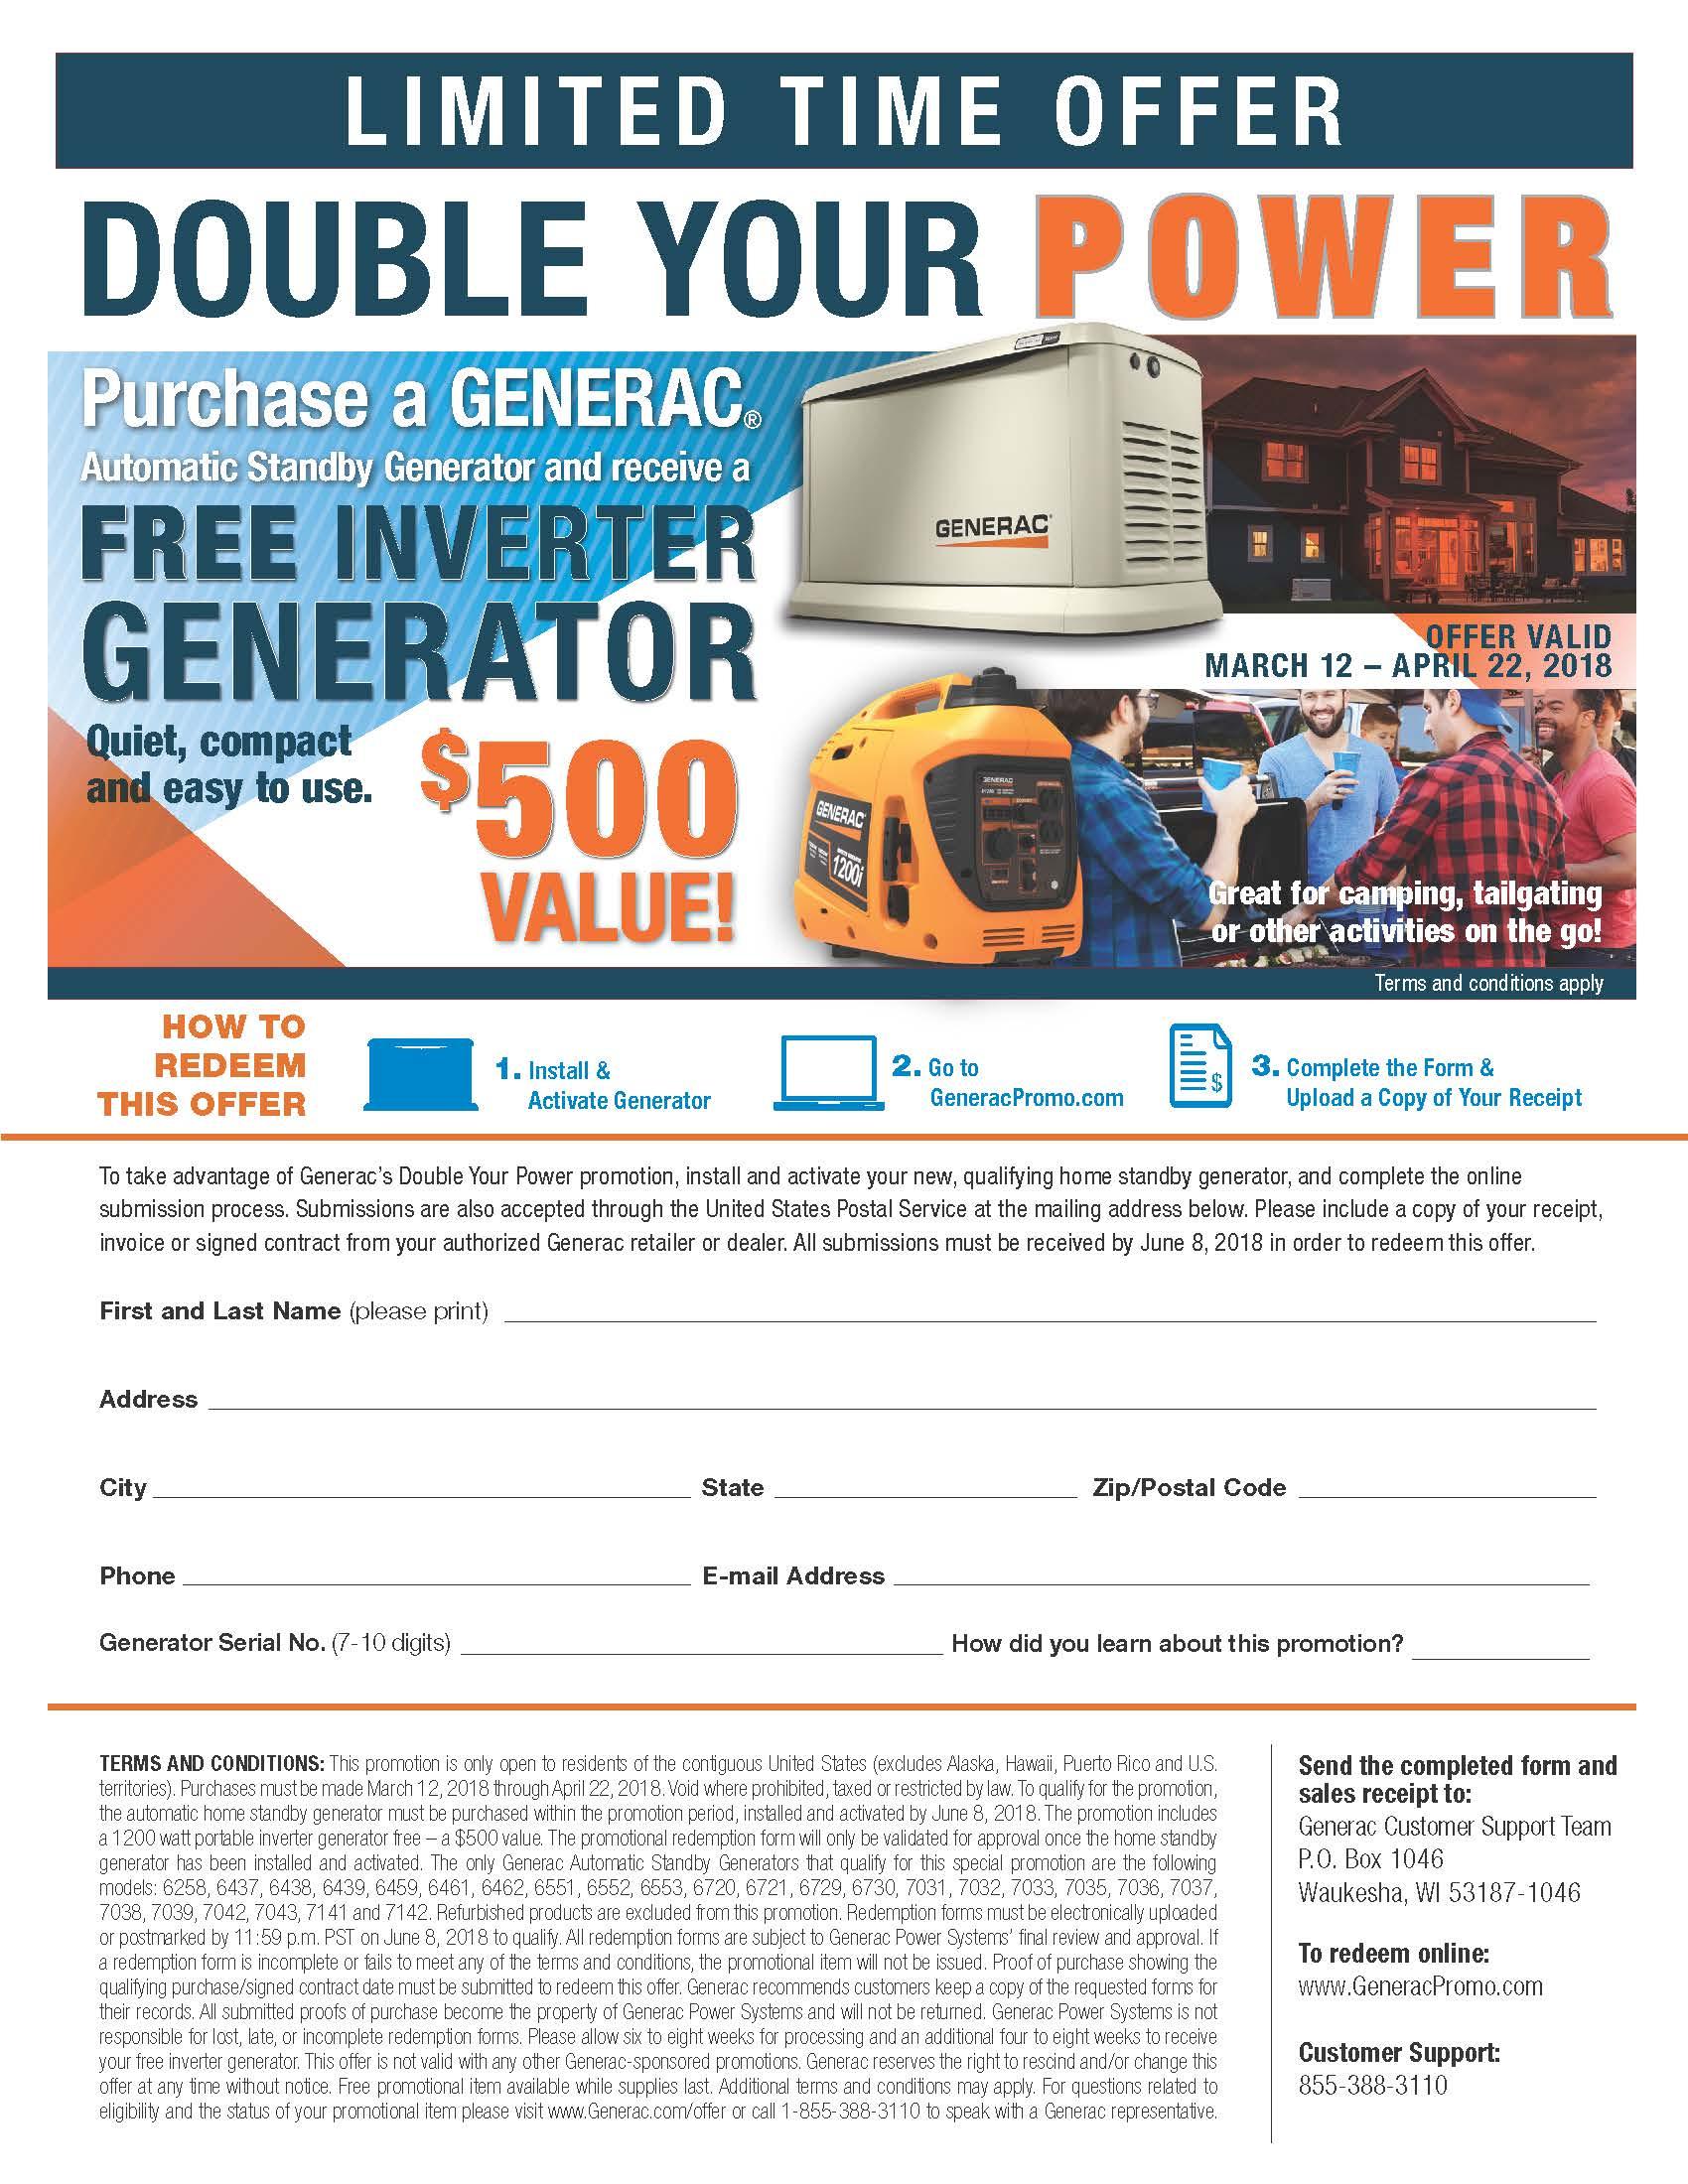 Generac – DOUBLE YOUR POWER